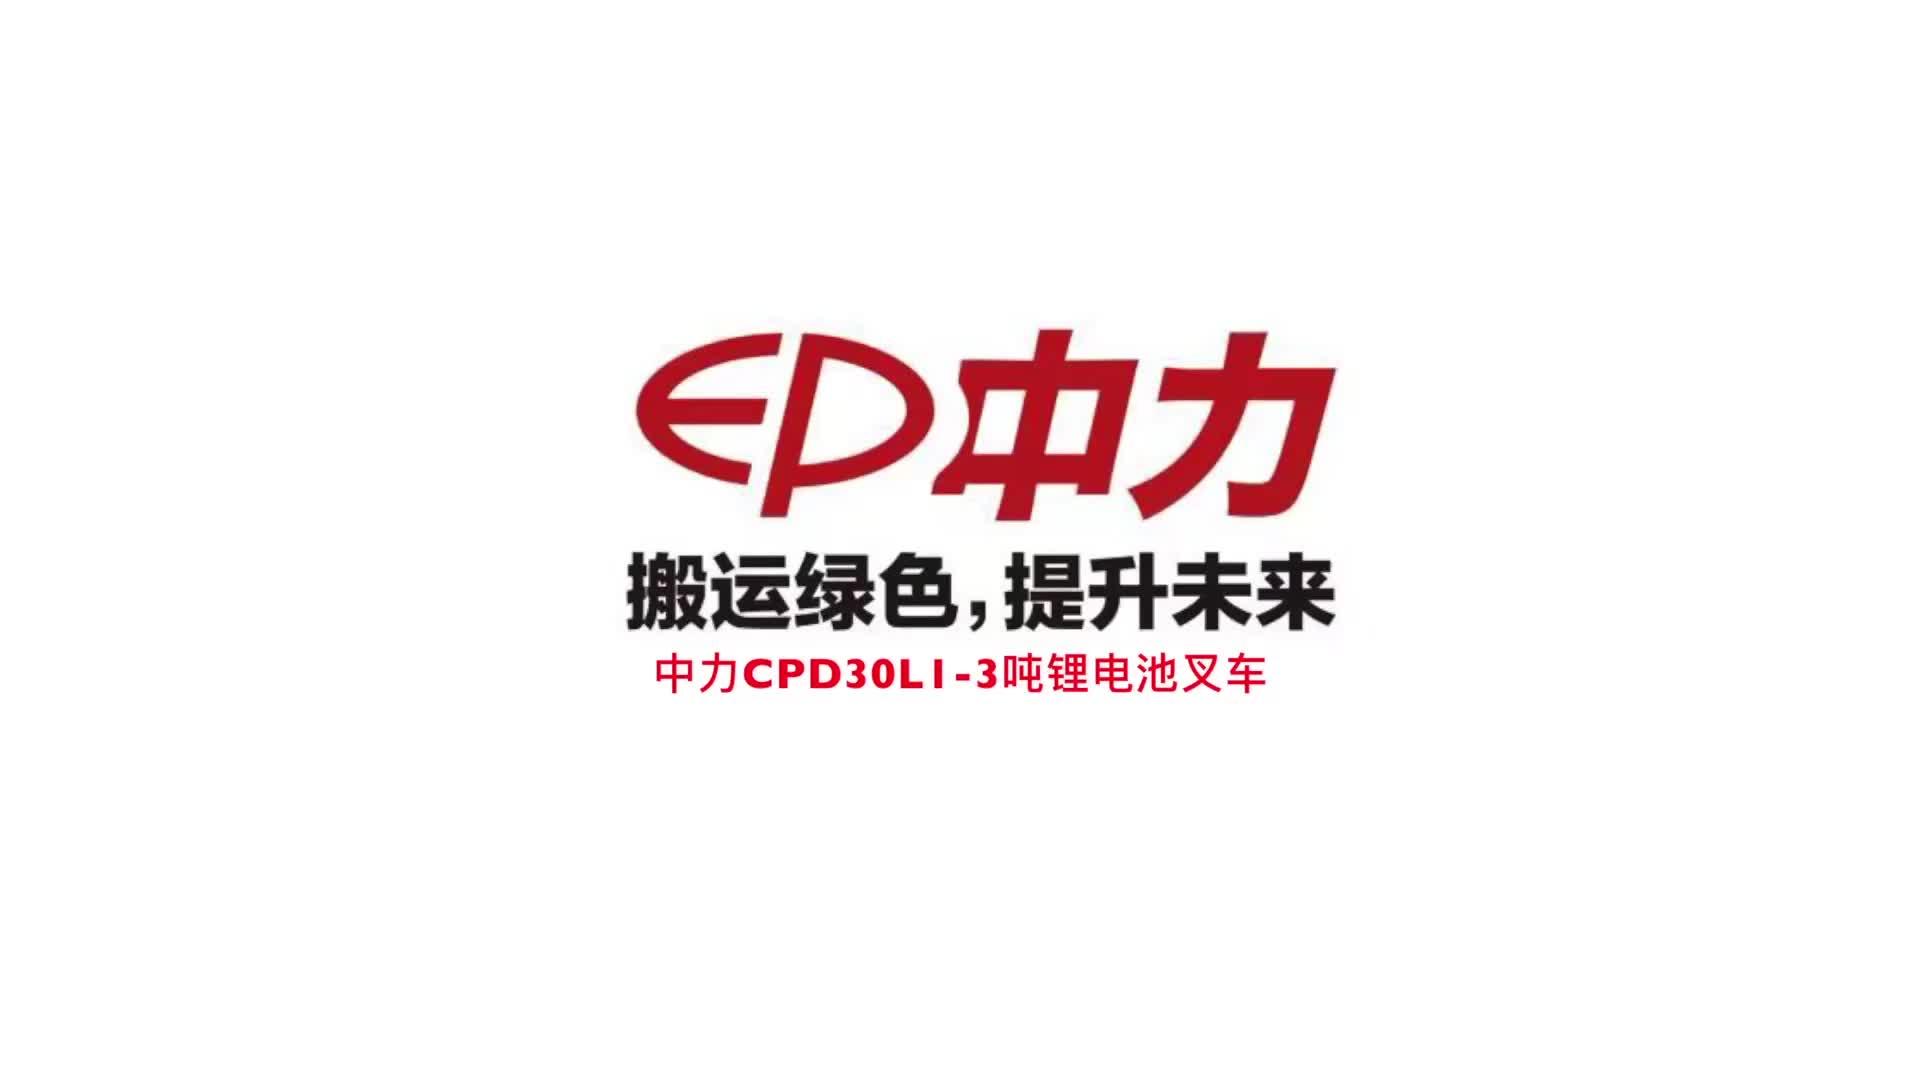 CPD30_35L1S 3.0_3.5吨电动平衡重叉车 锂电壹号